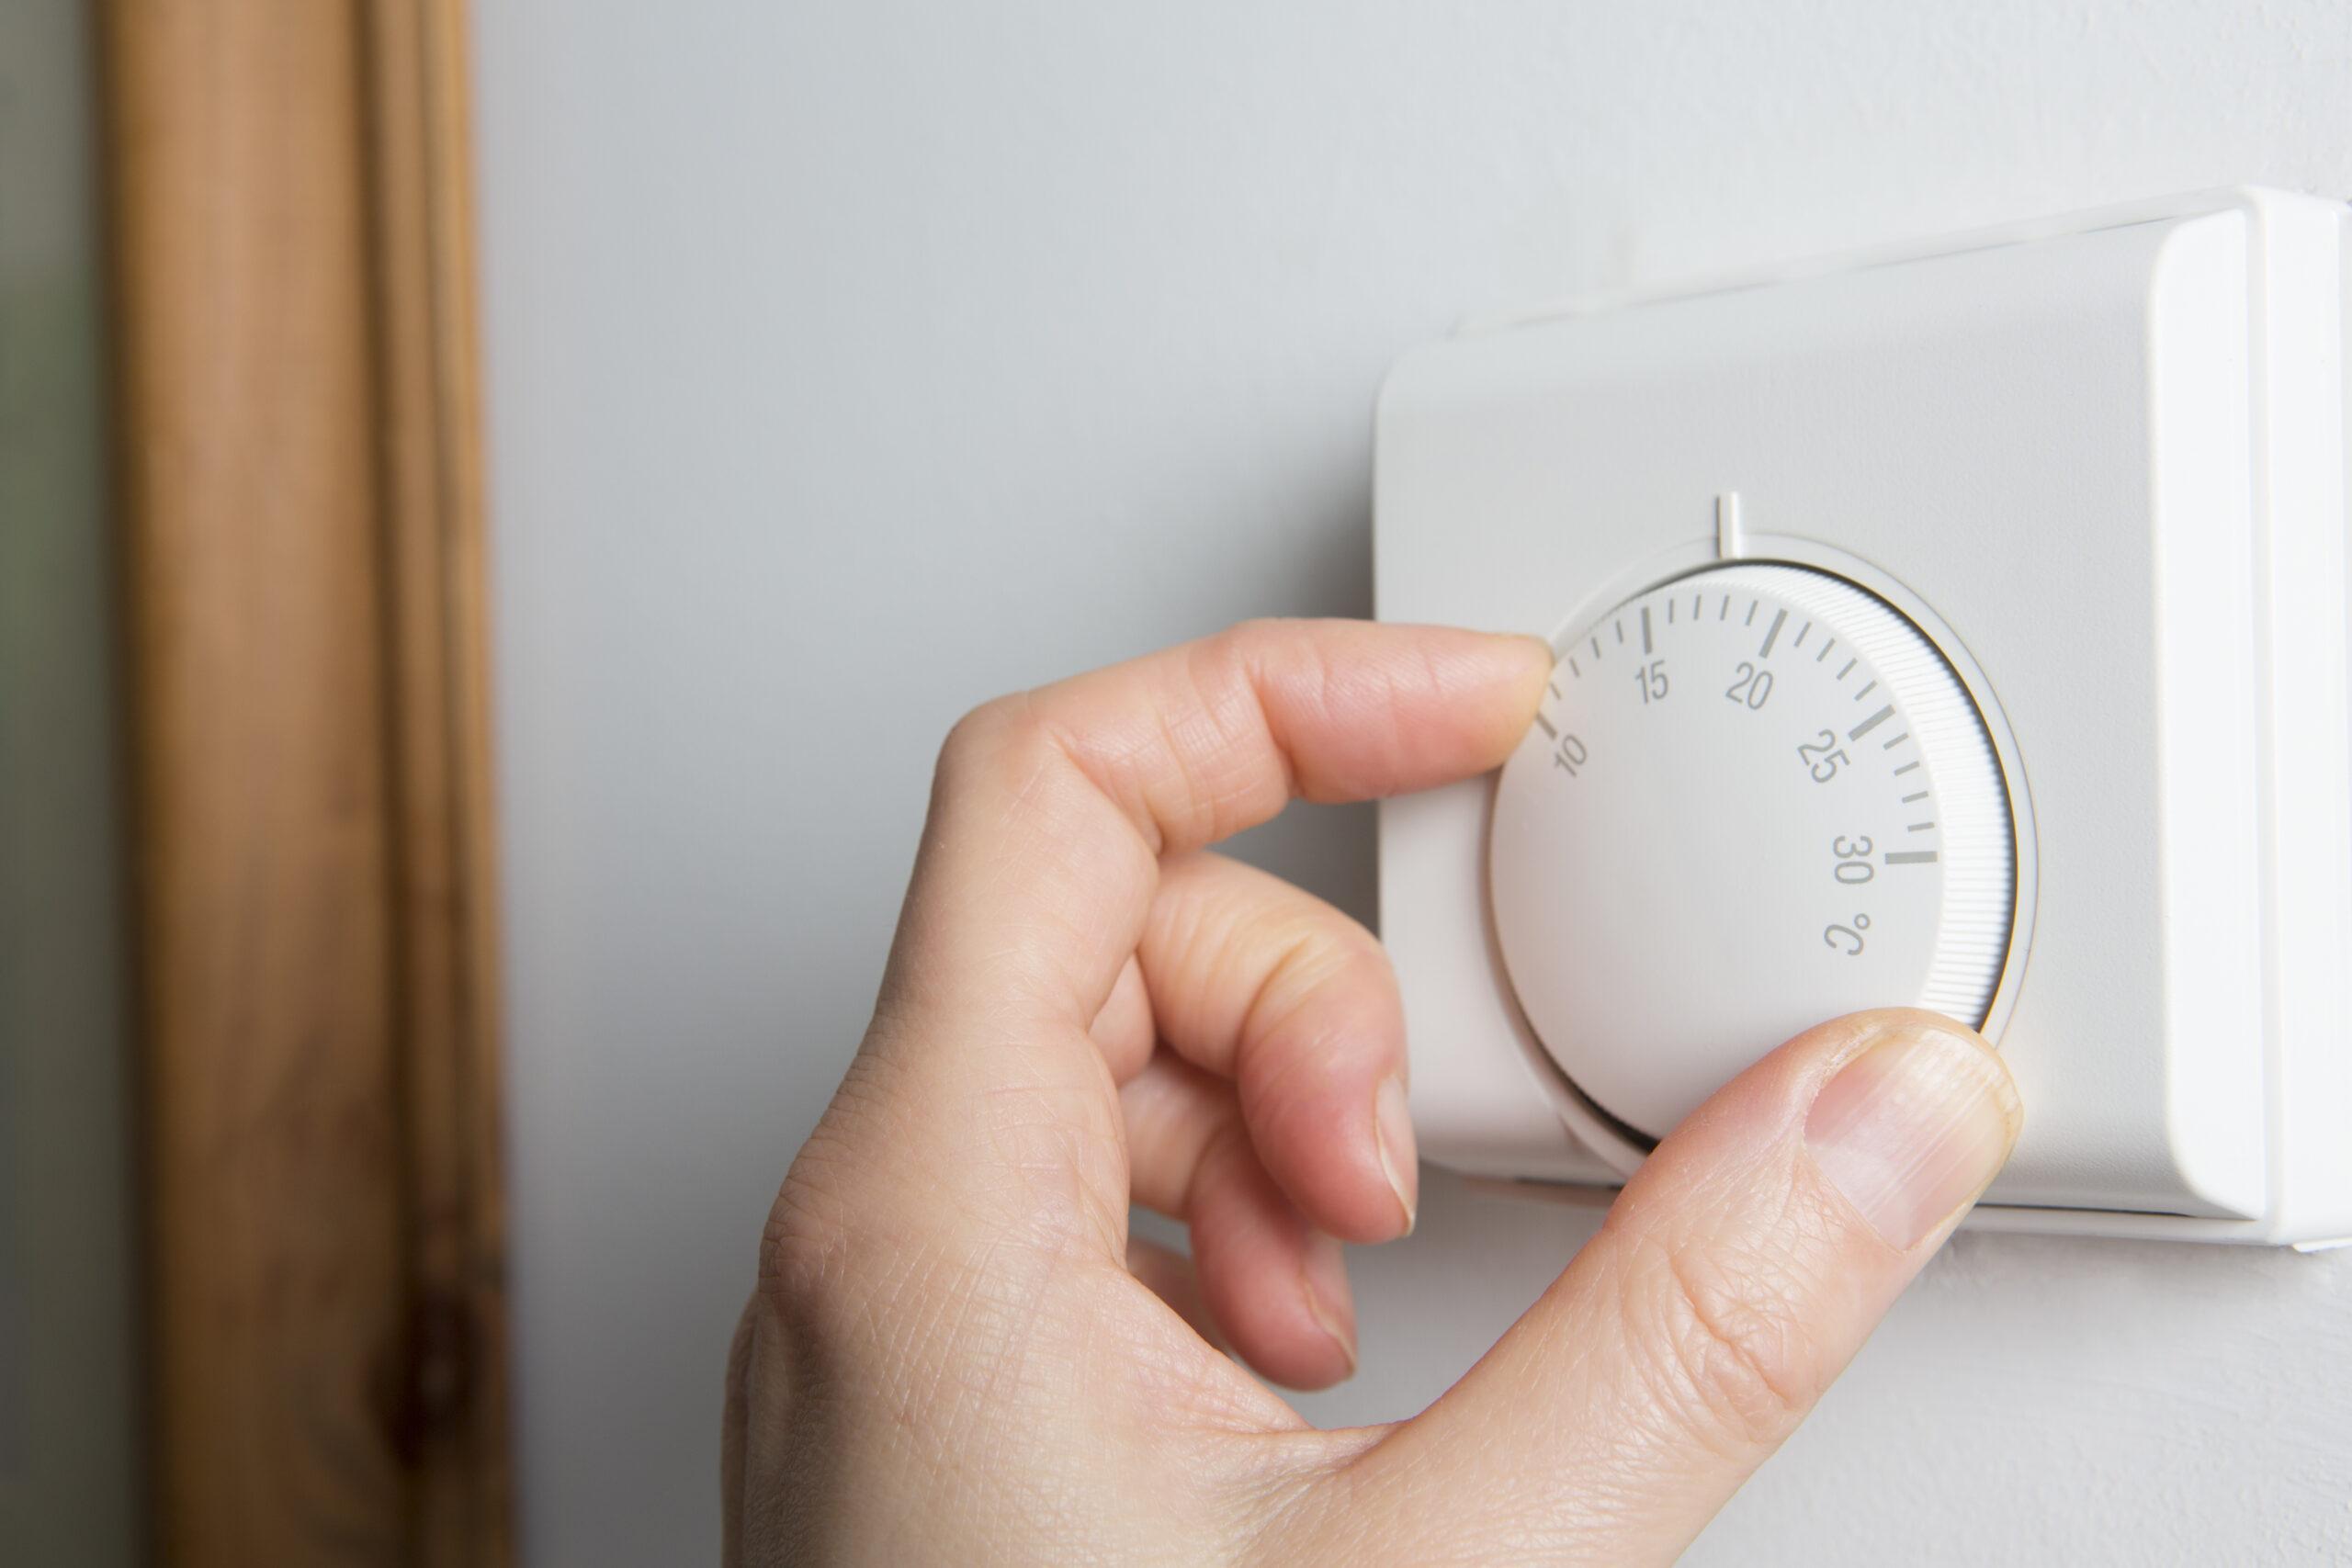 thermostat adjusting